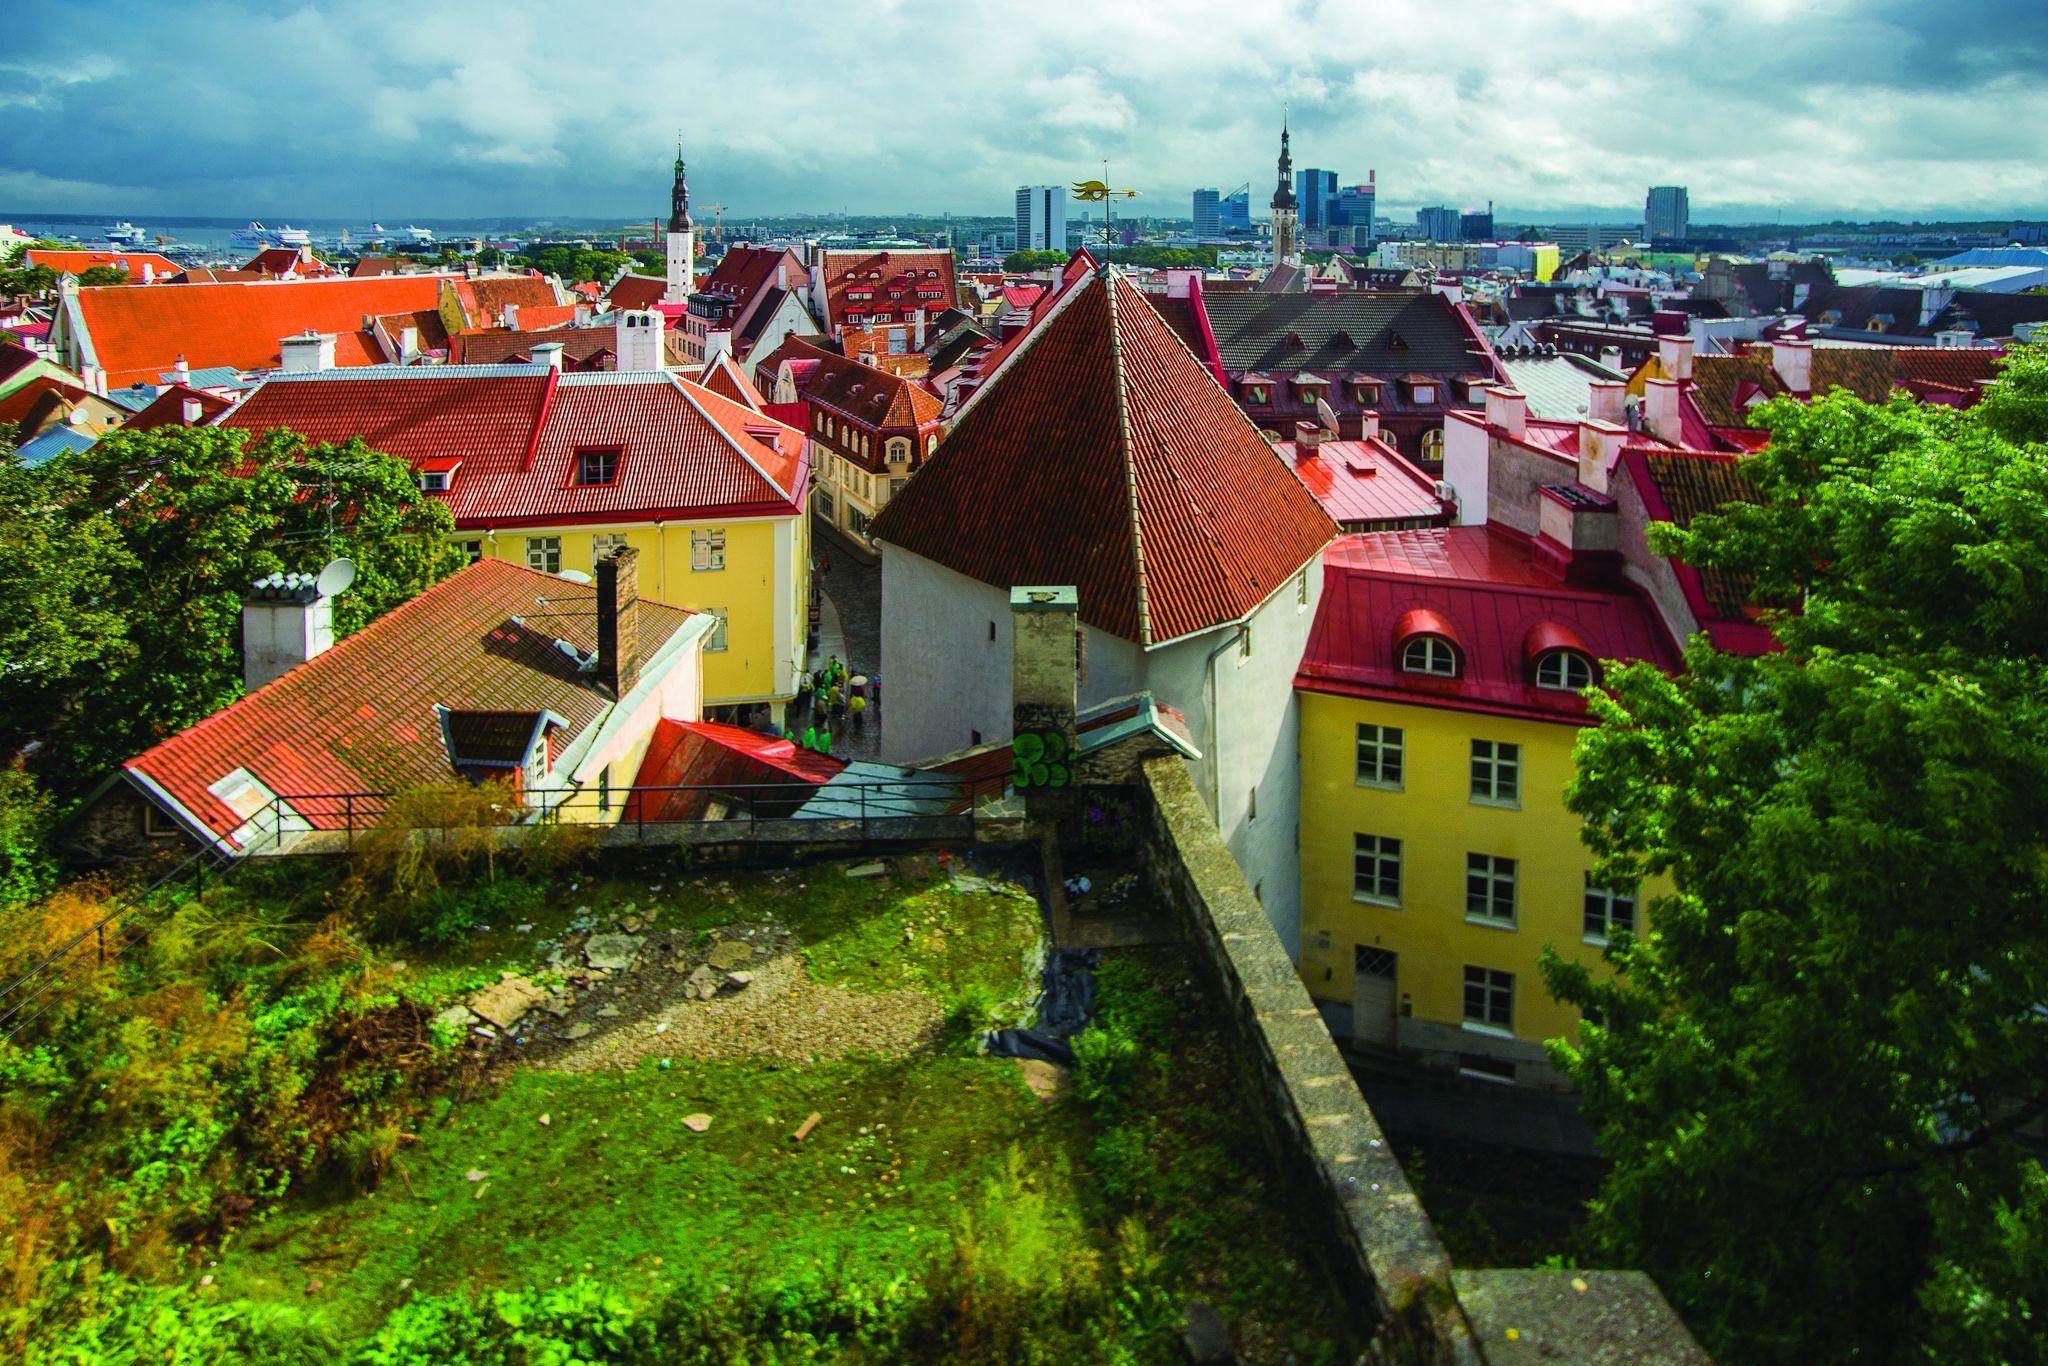 https://flic.kr/p/Gx83FH | Tallinn Old Town | Photo by Mats Õun